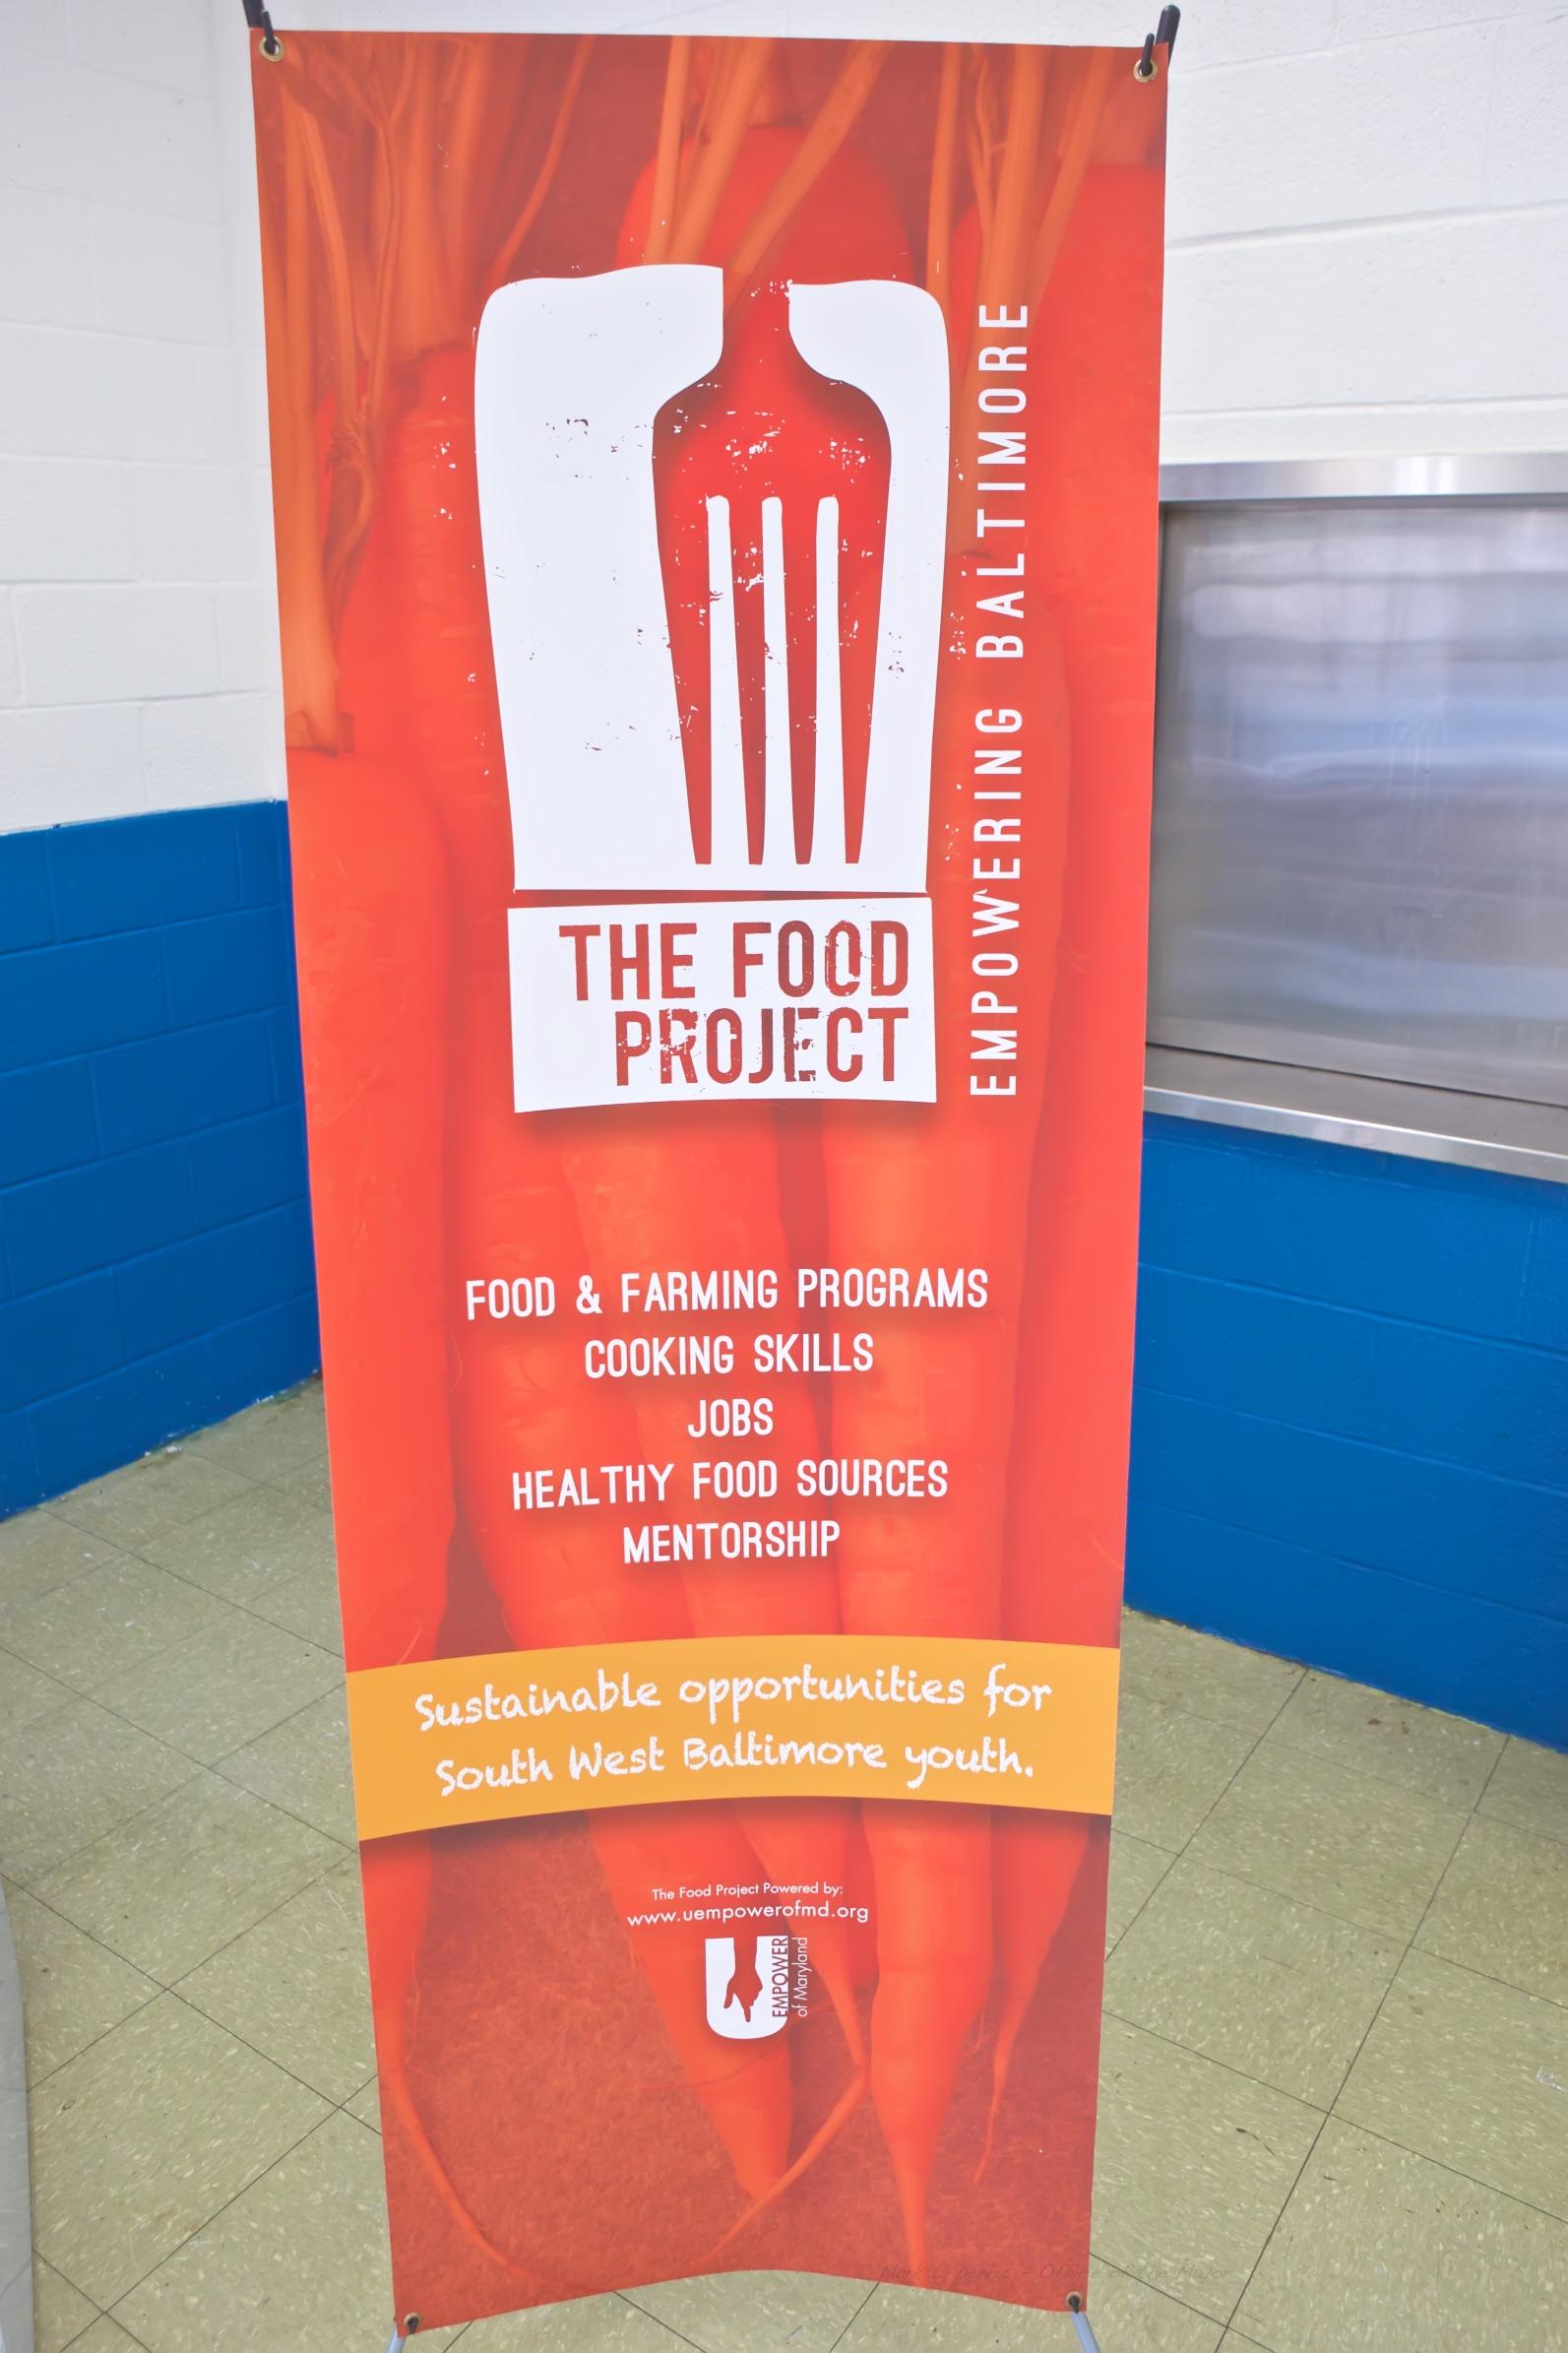 January 26, 2019 - Site visit to The Food Project, 424 S. Pulaski Street 2019-01-26 (7).jpg